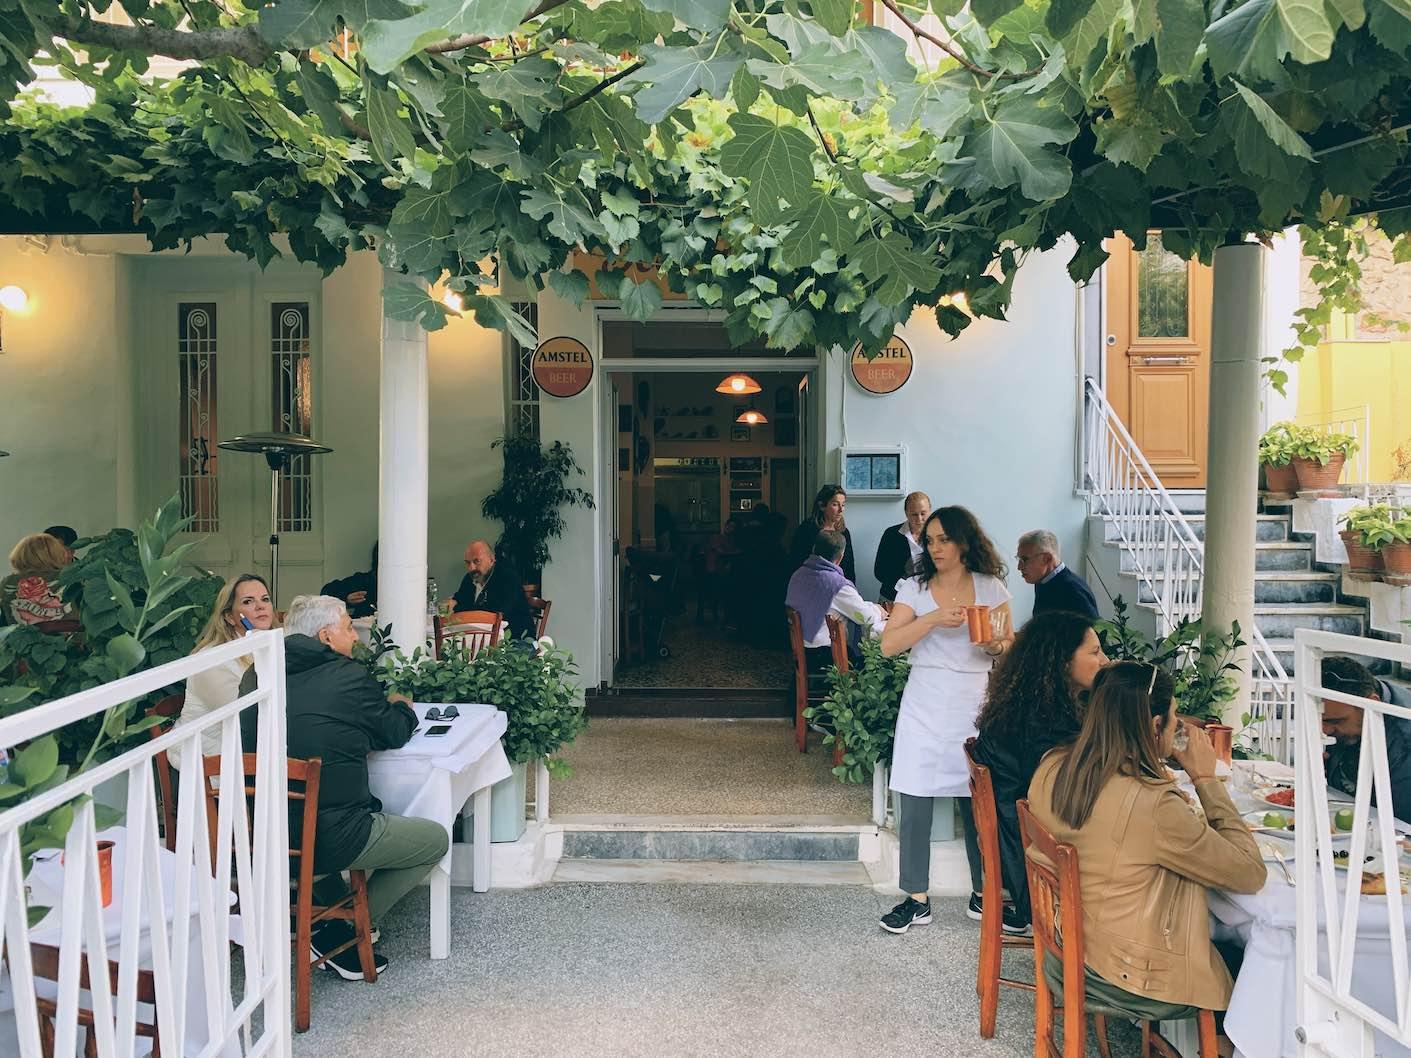 Athens: old school taverna for shrimps and fish at Ta Kanaria